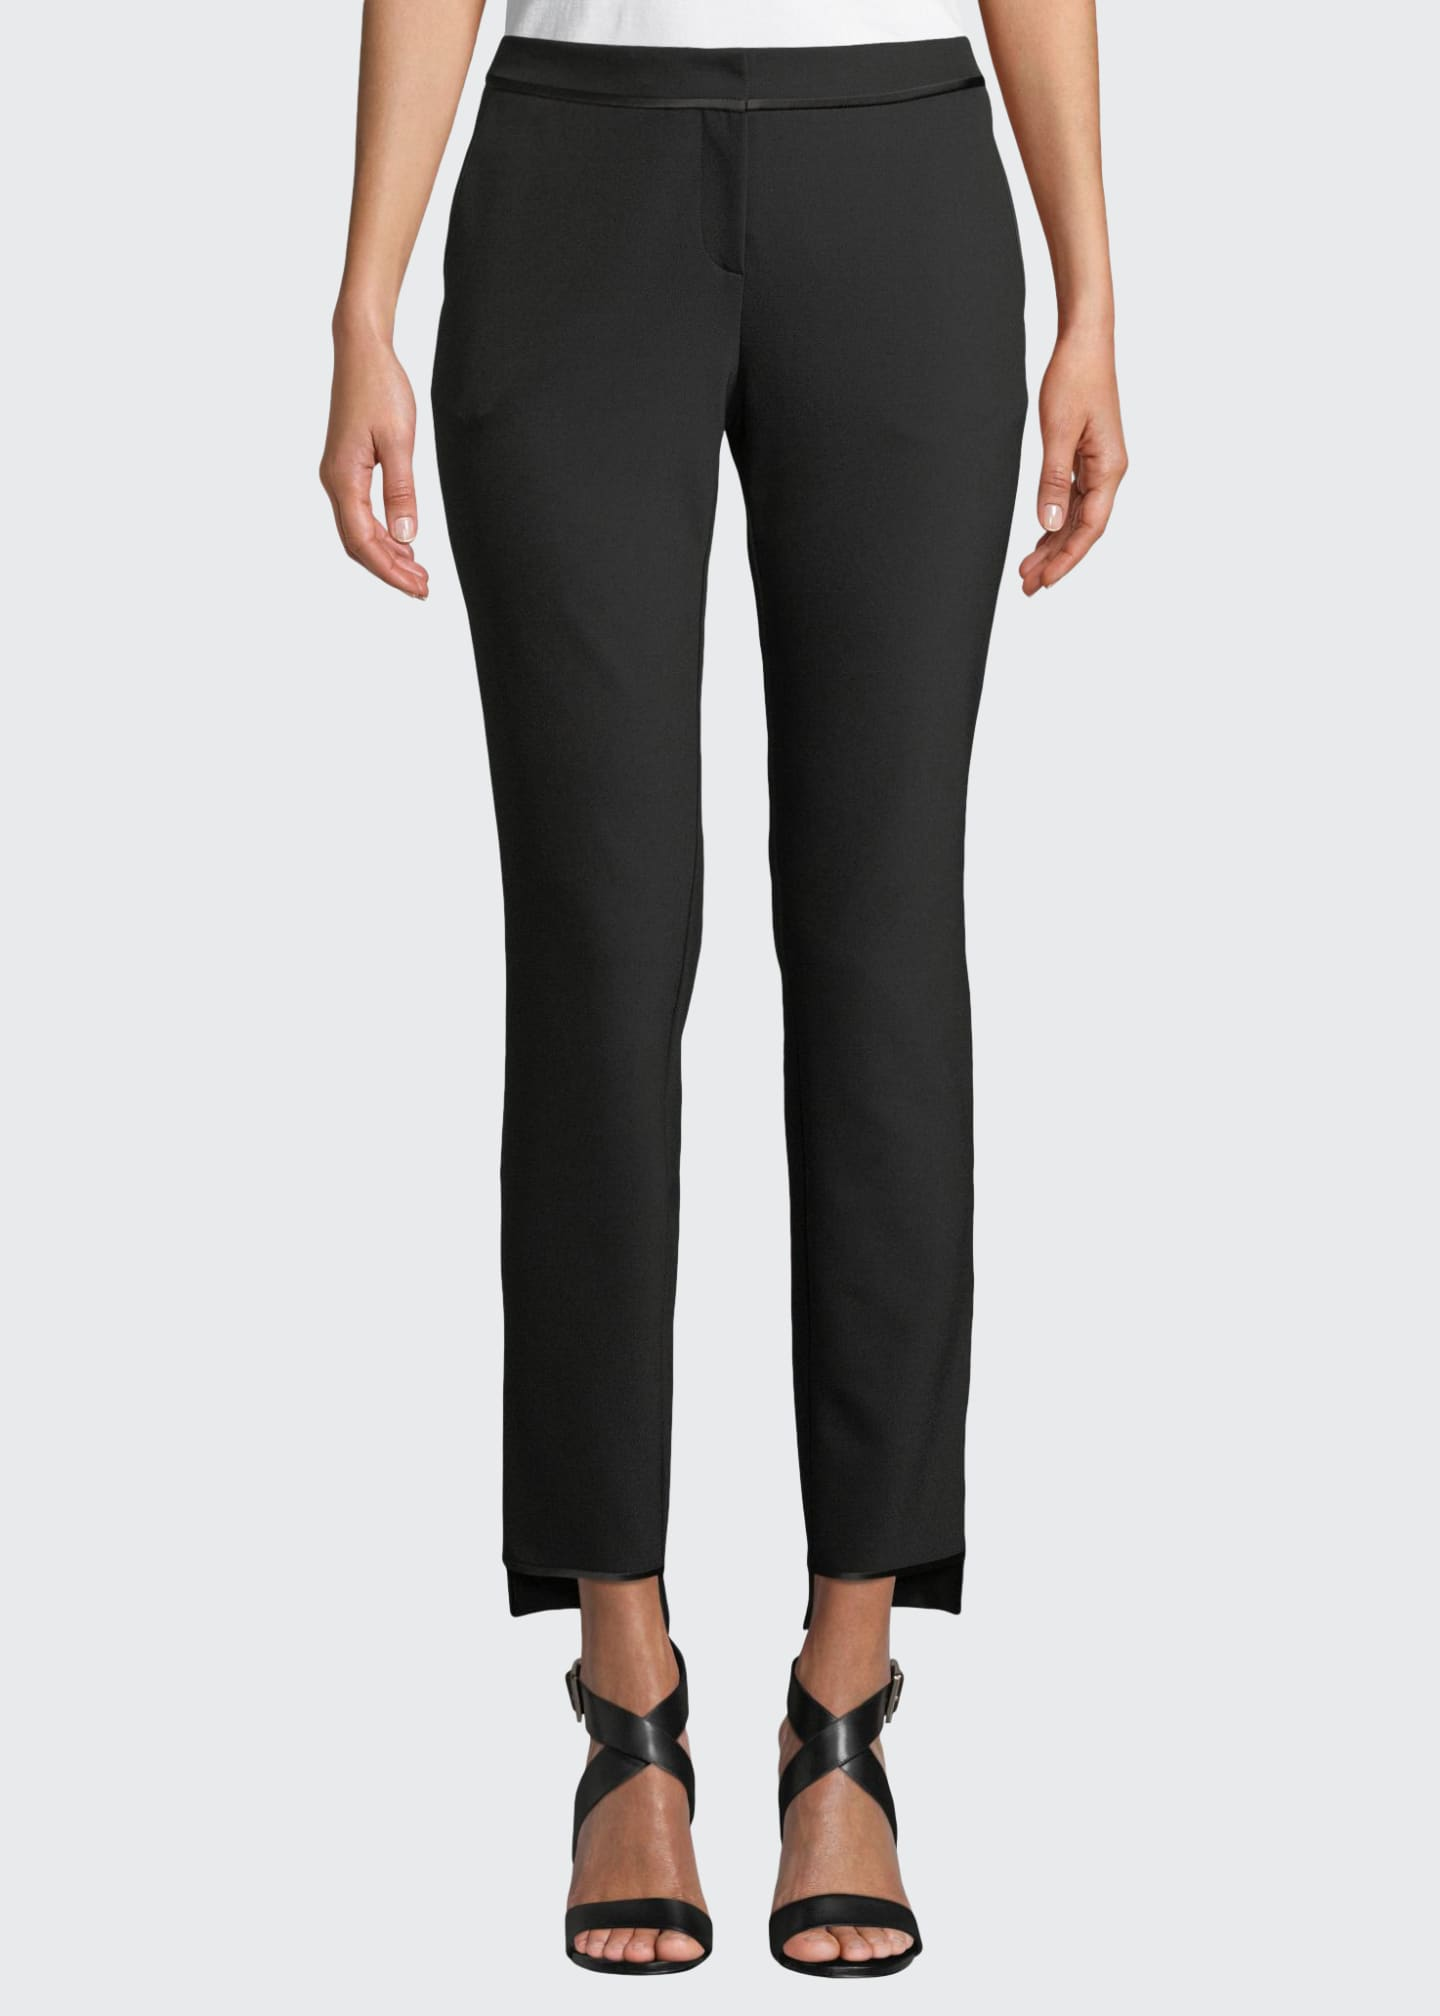 Lafayette 148 New York Manhattan Slim-Leg Stretch Pants